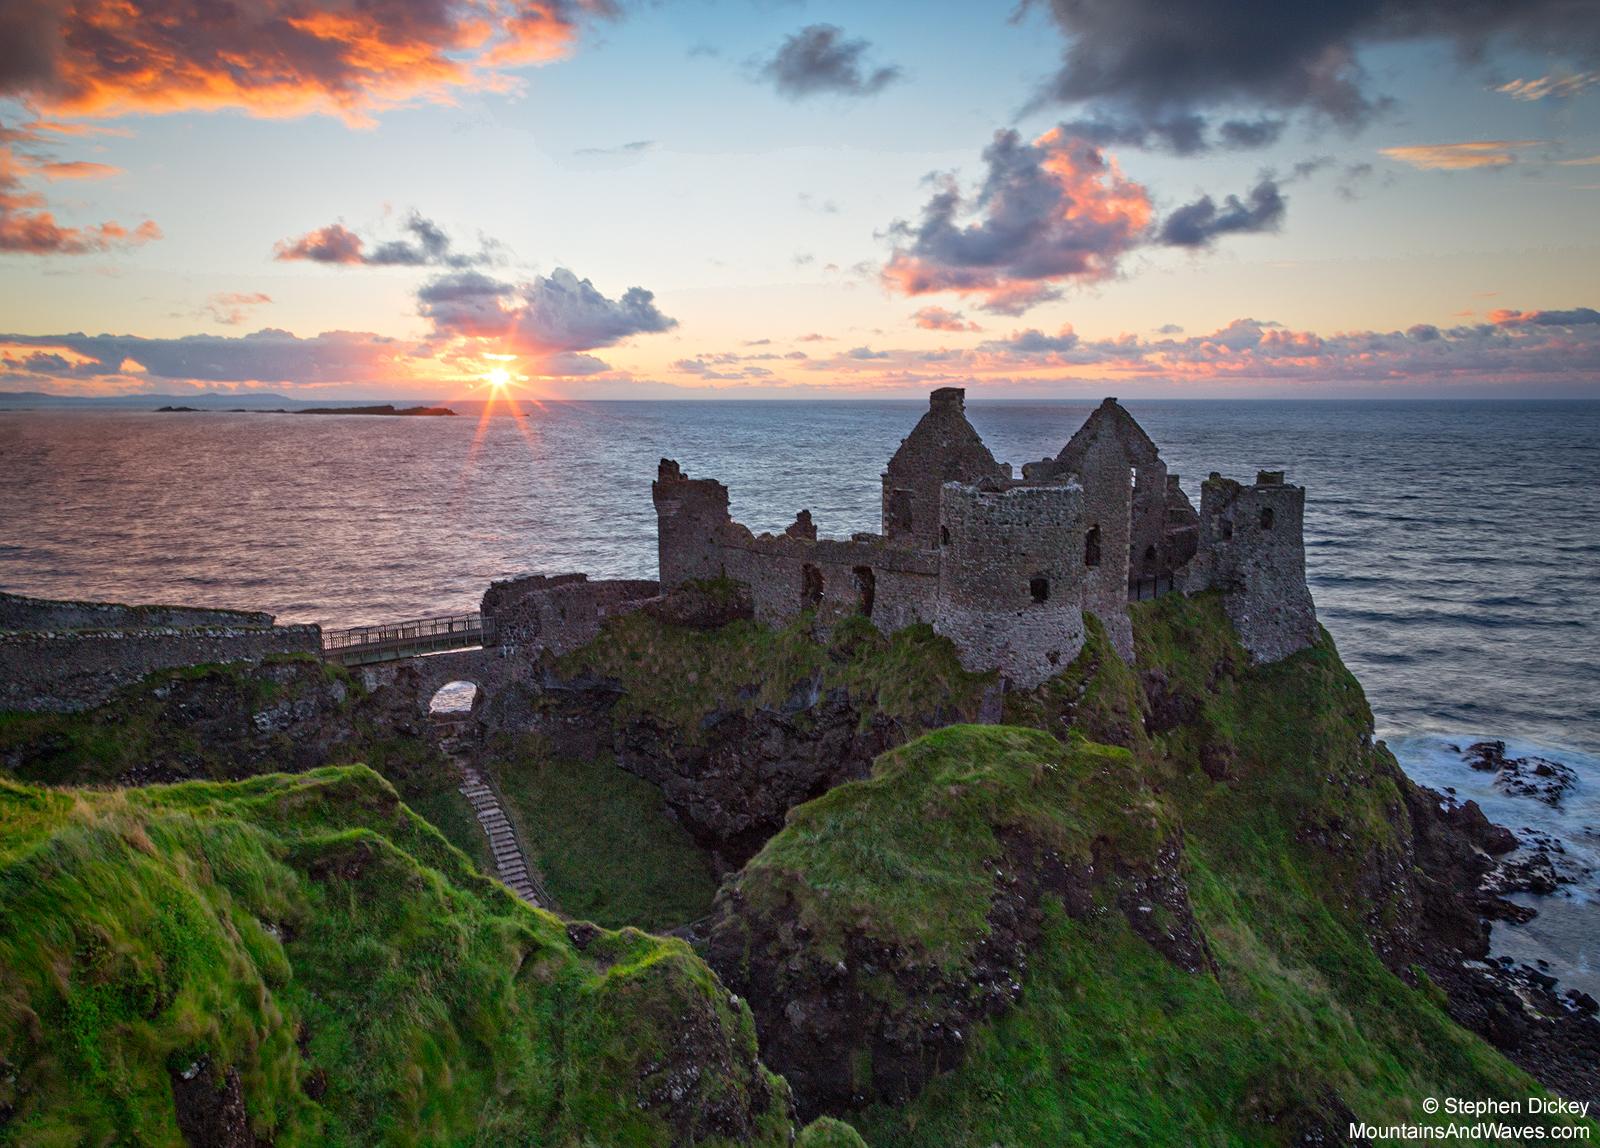 Dunluce Castle, County Antrim, Northern Ireland